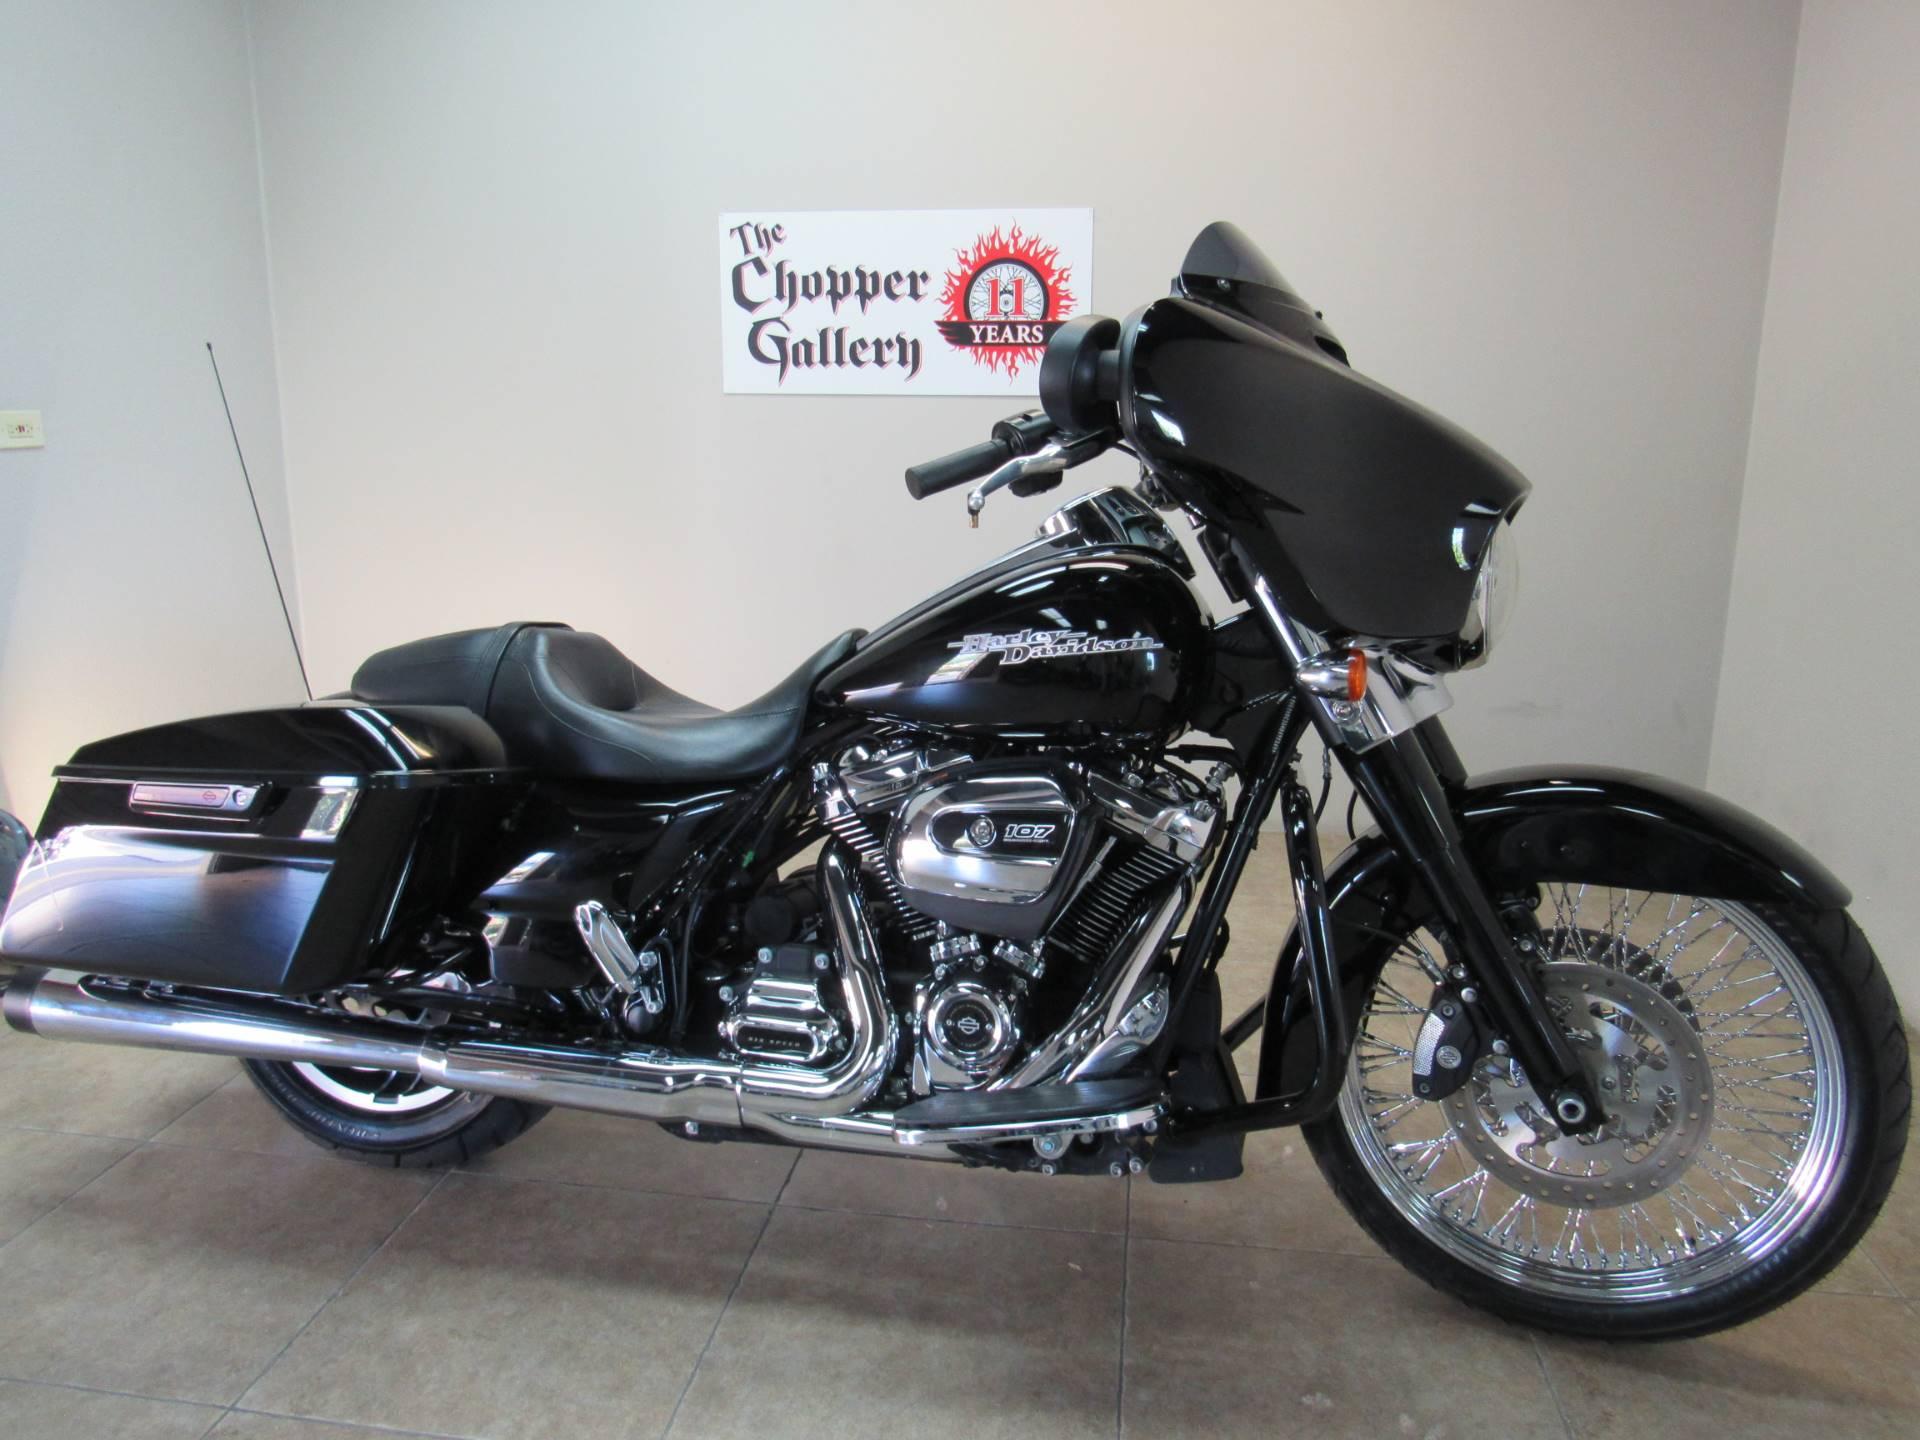 2017 Harley-Davidson Street Glide® in Temecula, California